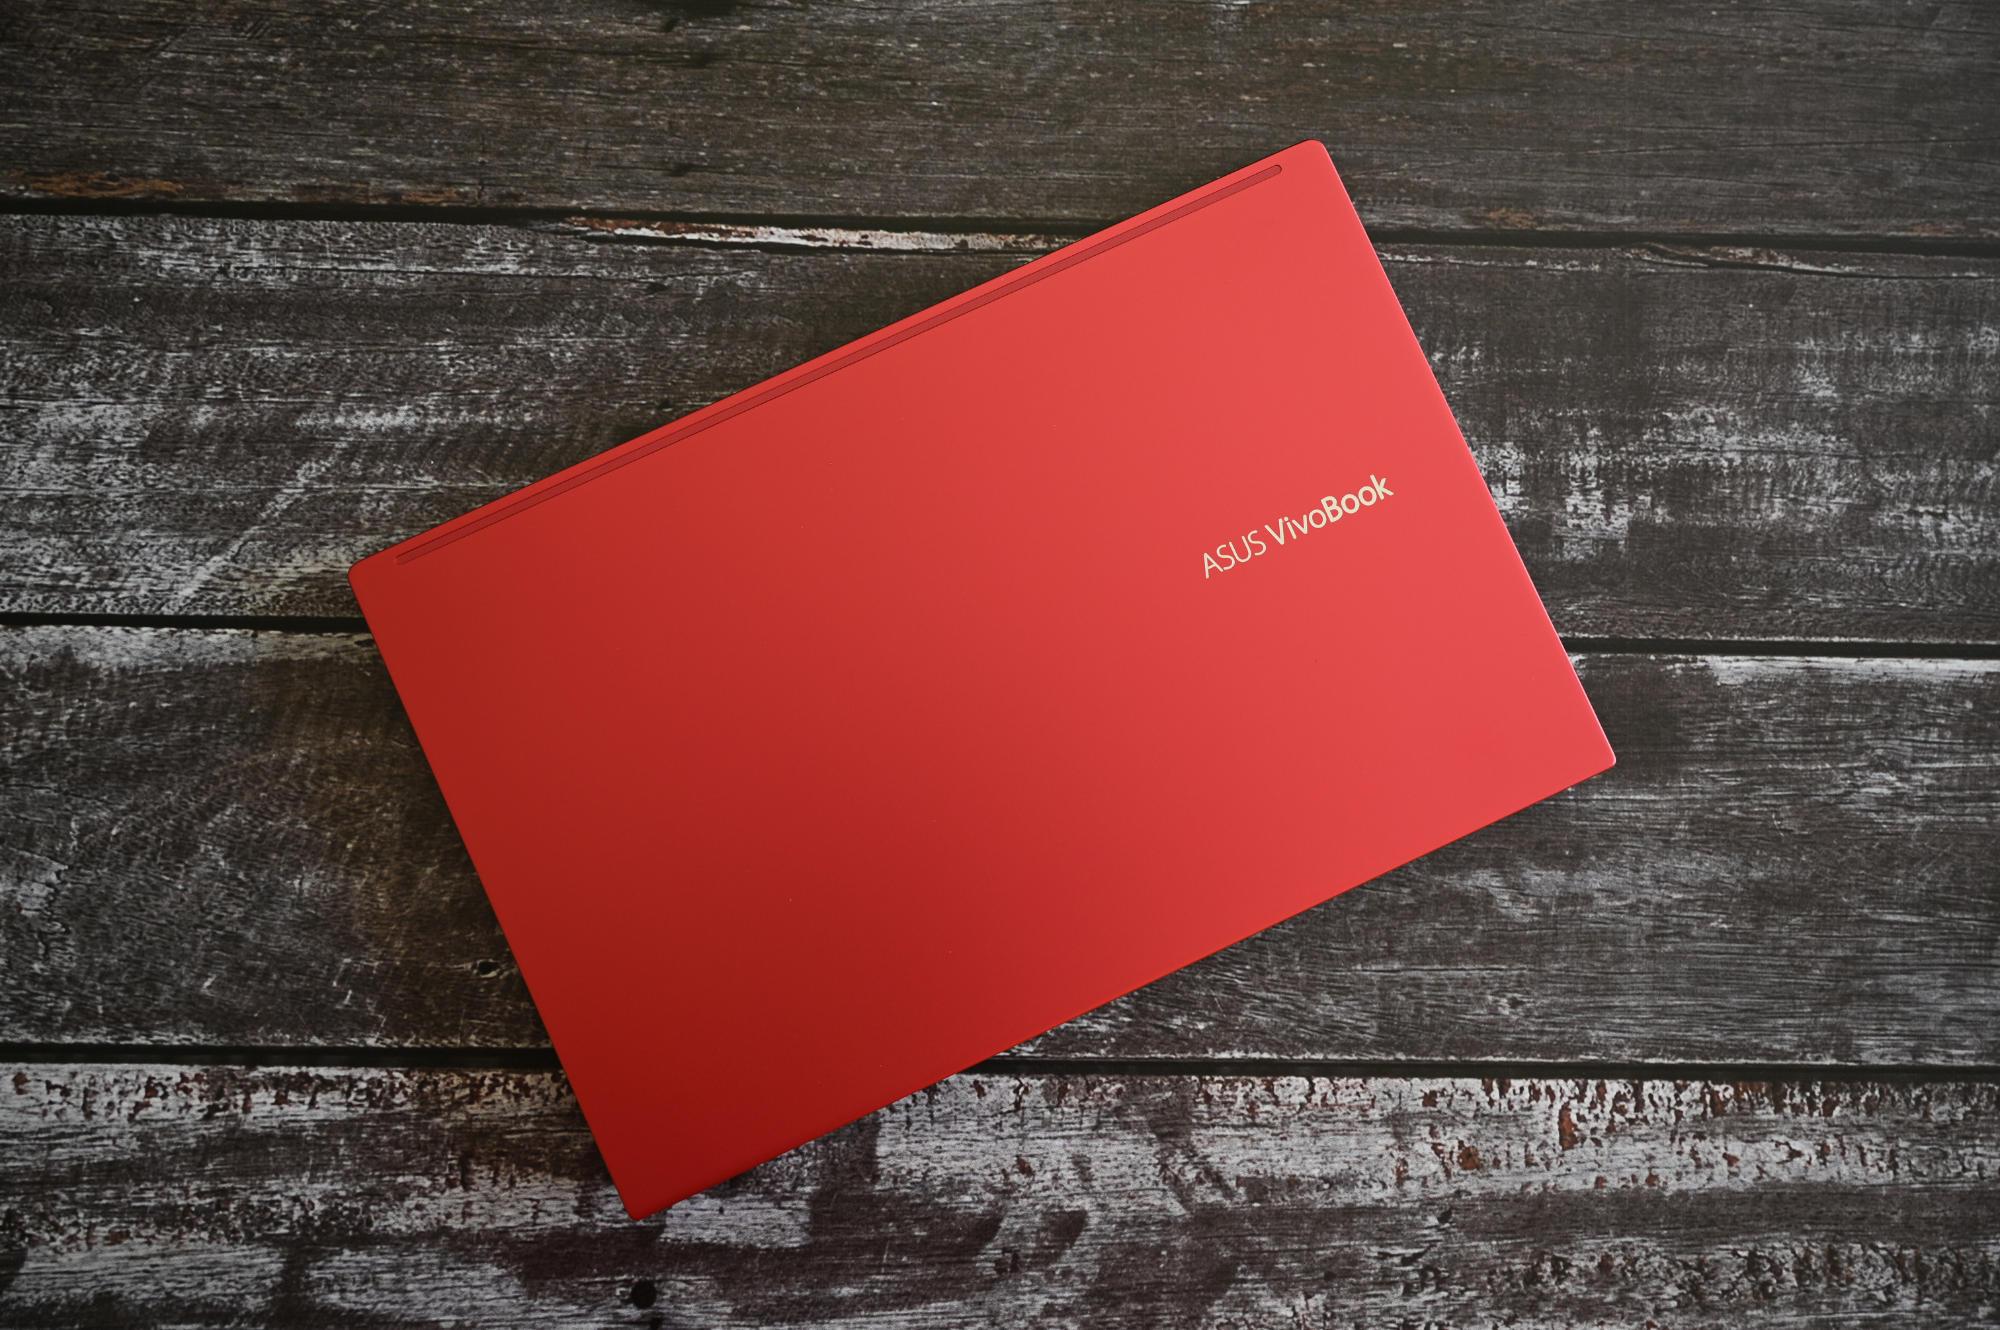 ASUS Vivobook S14 czerwona klapa